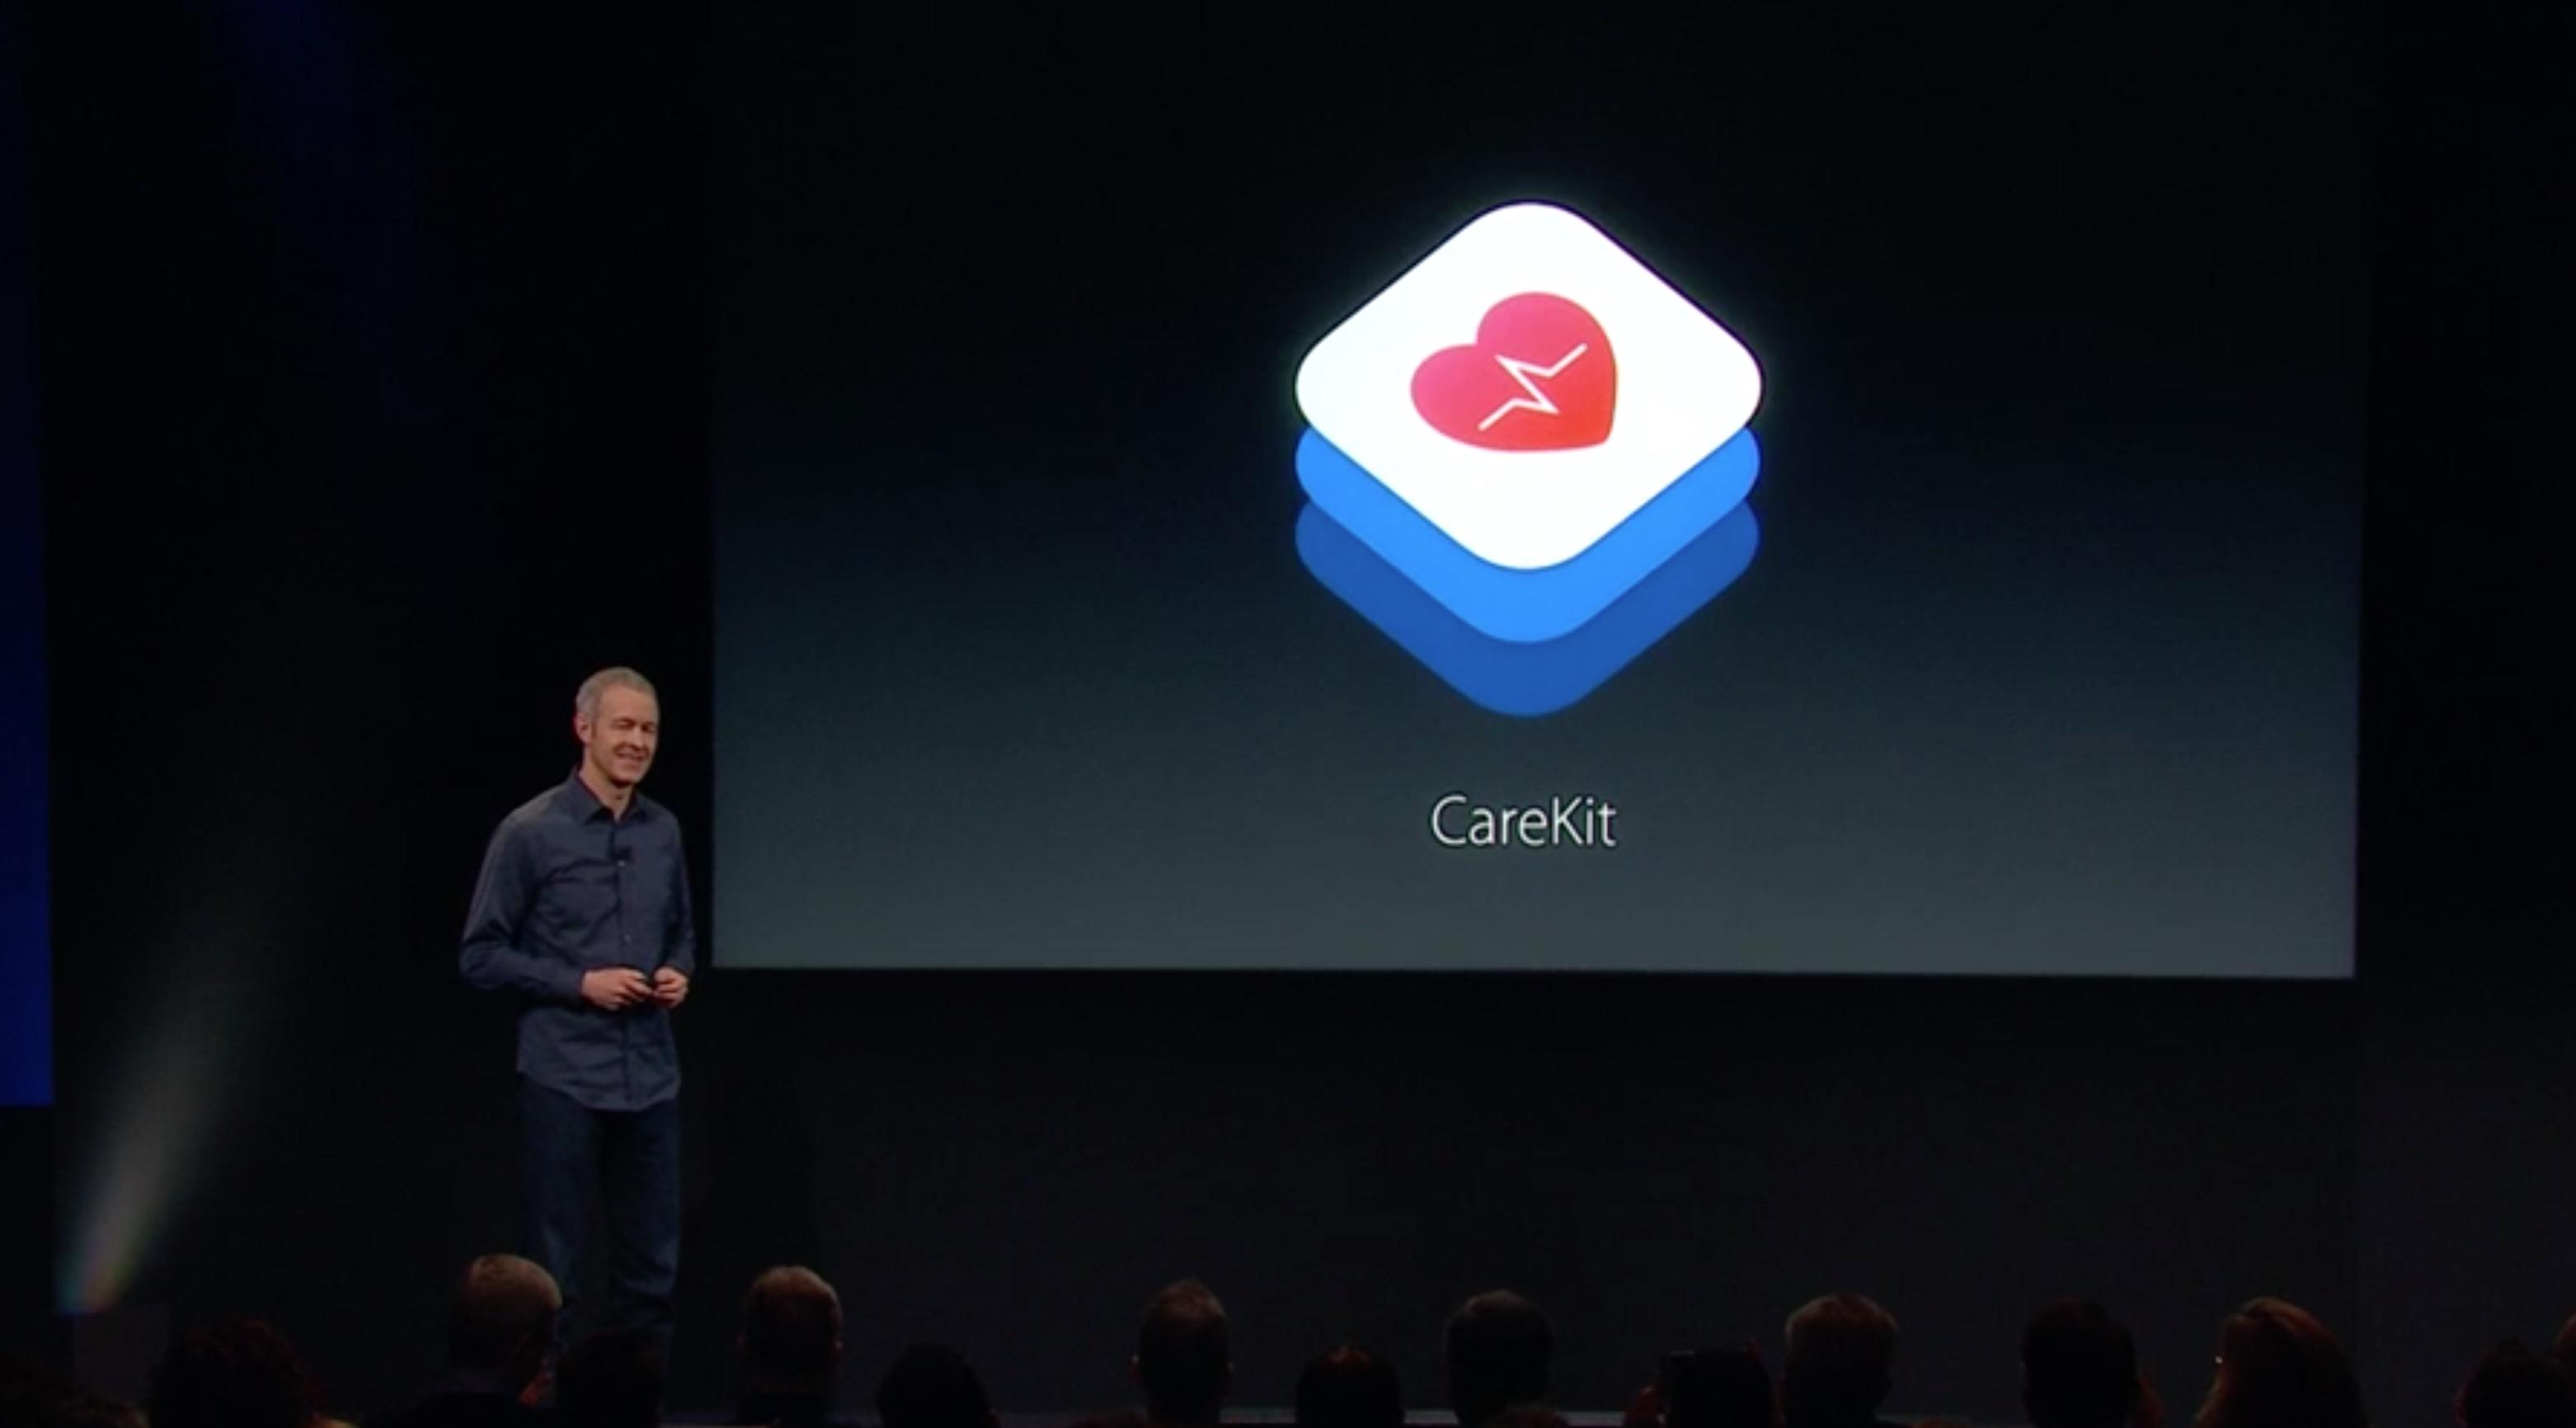 Apple CareKit